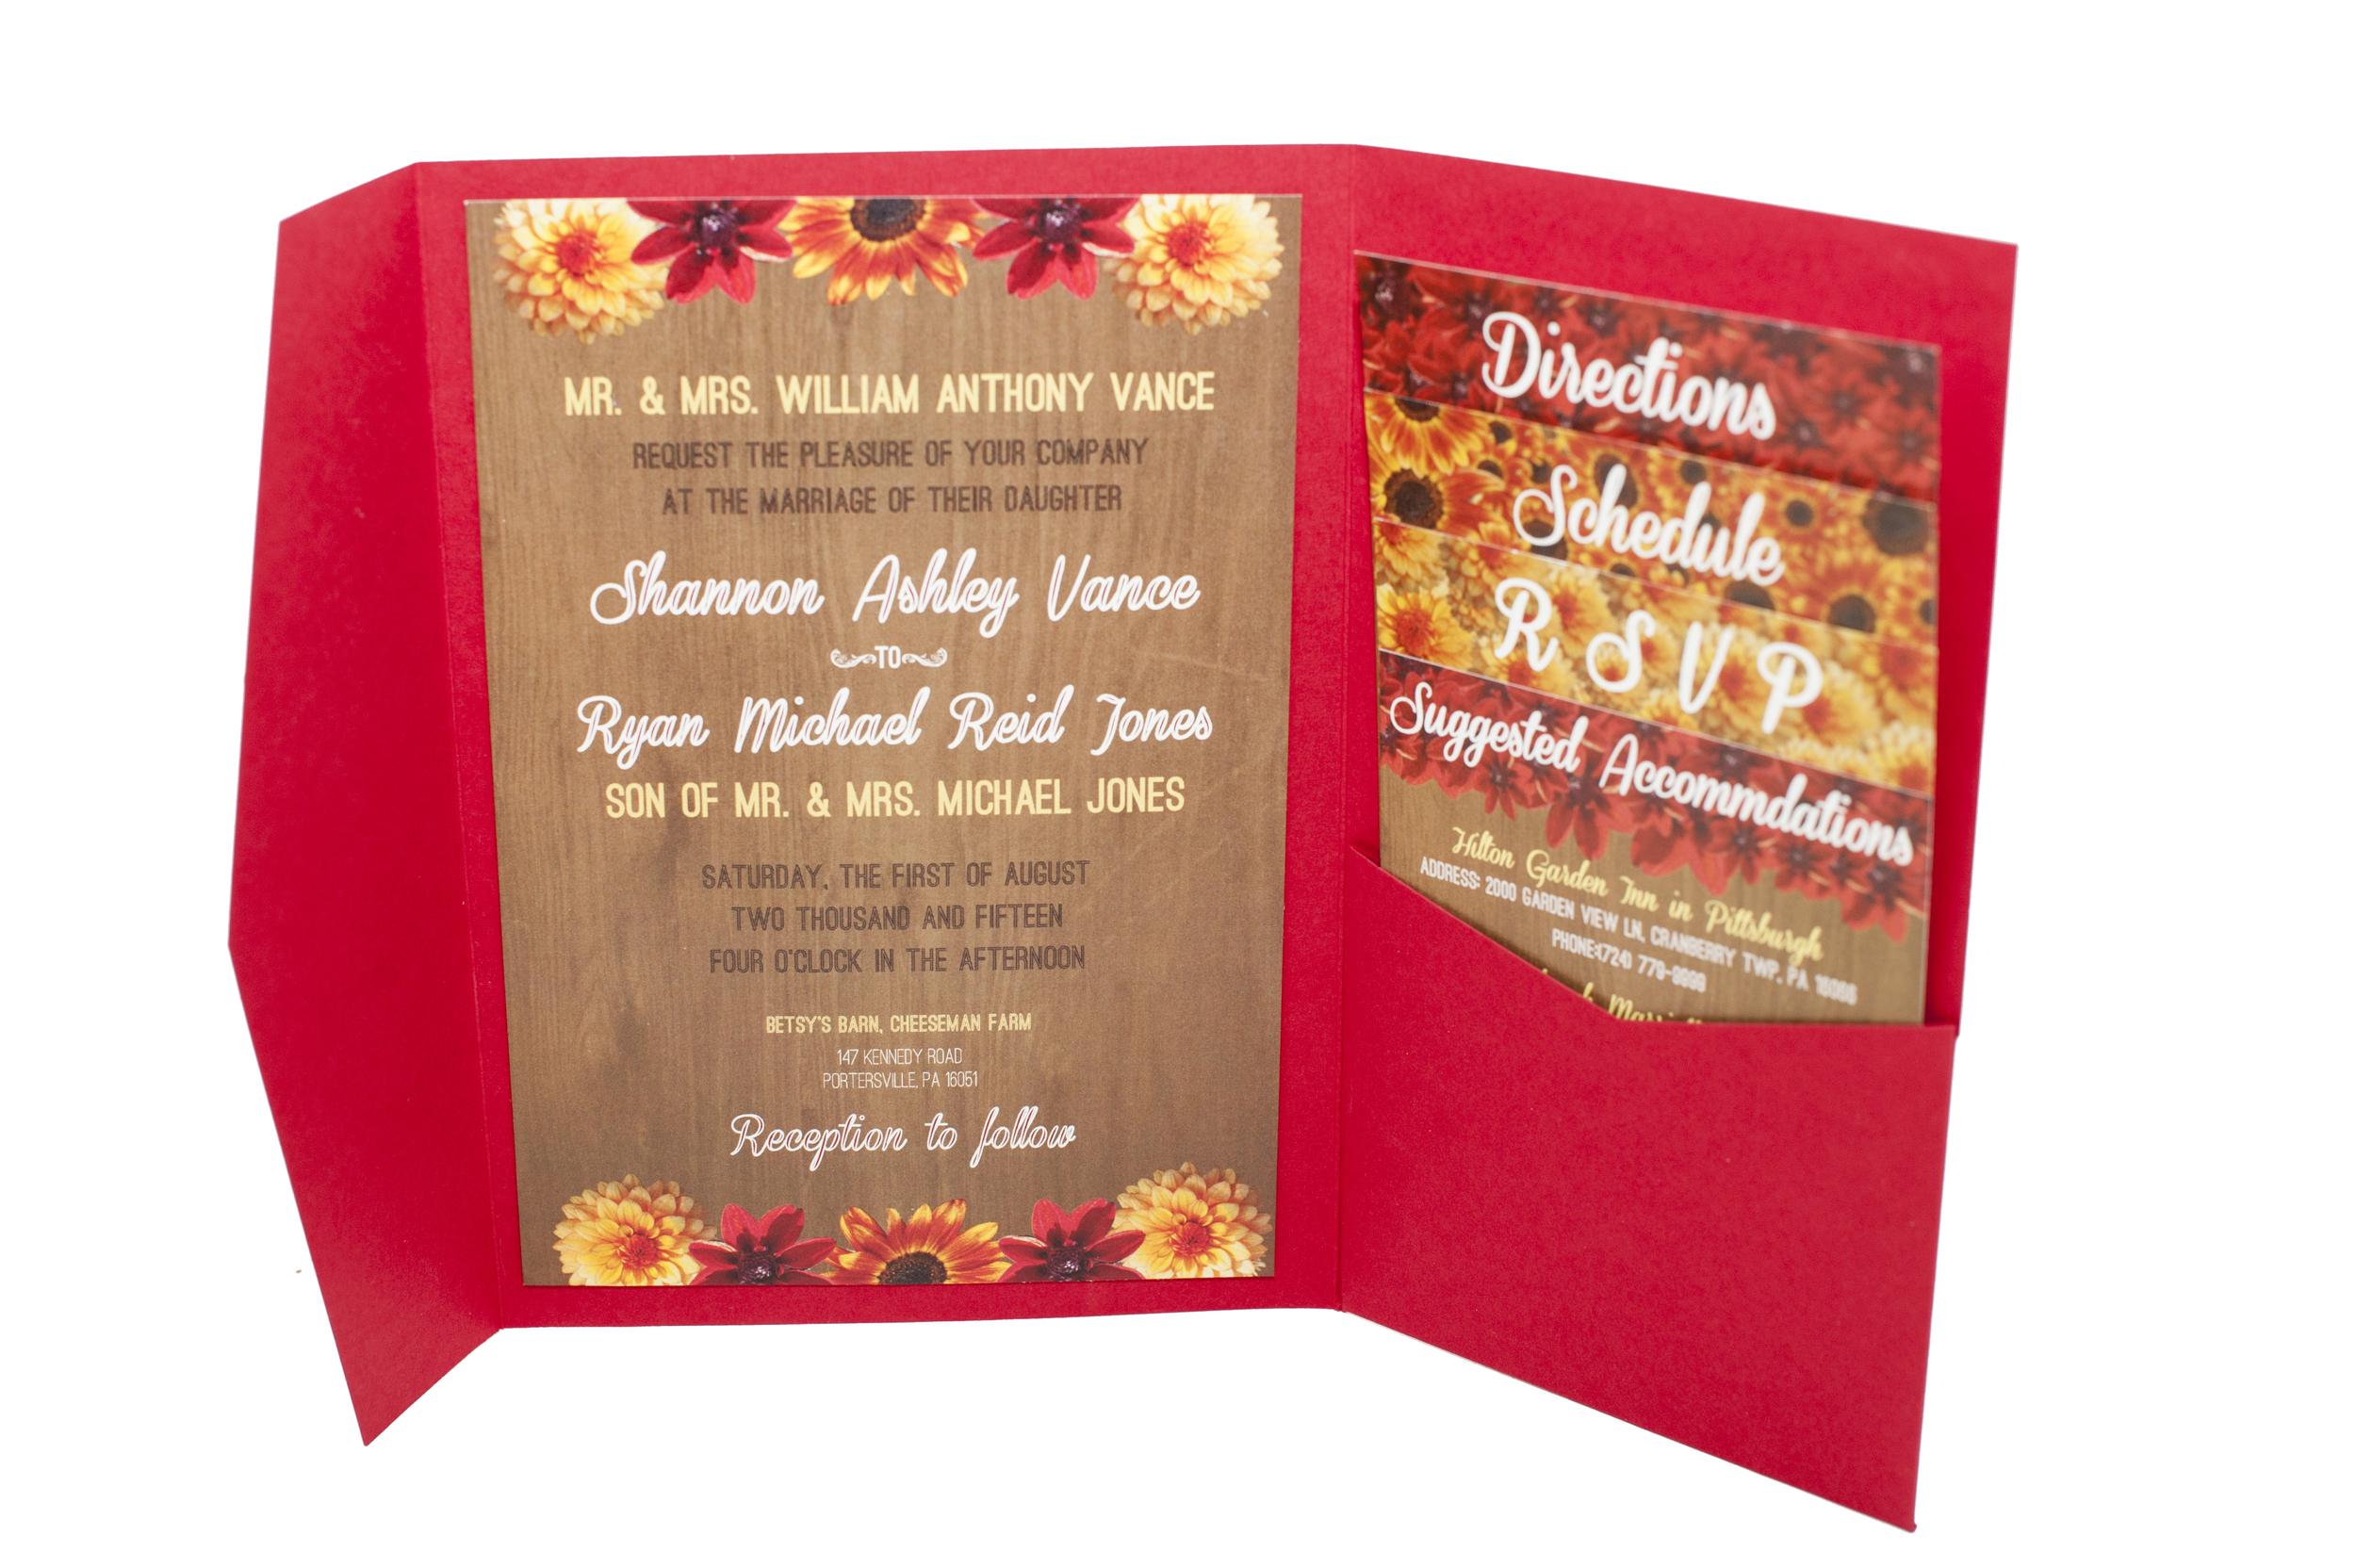 Wedding invitations — Allegheny Archives & Media, LLC